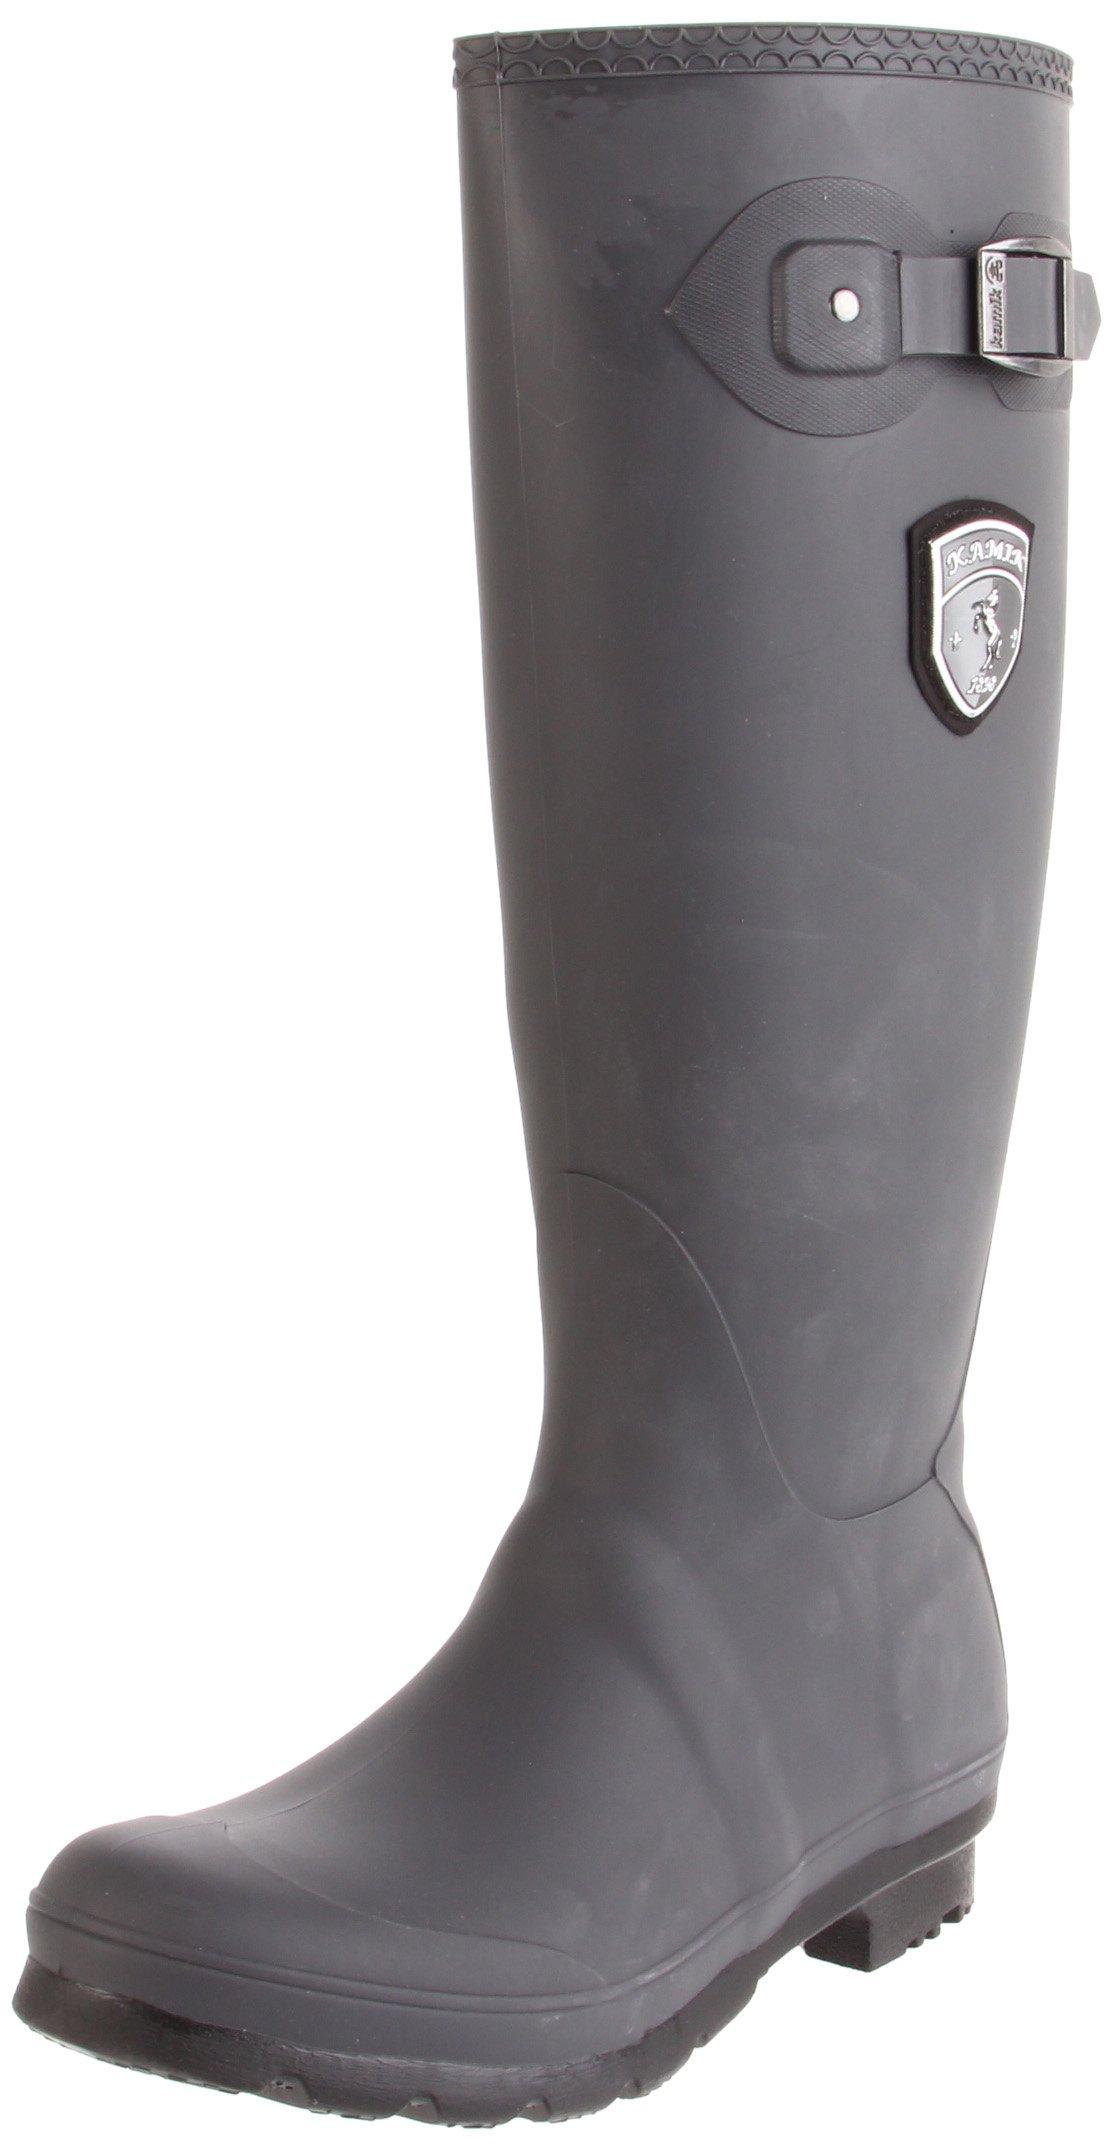 Kamik Women's Jennifer Rain Boot,Charcoal,10 M US